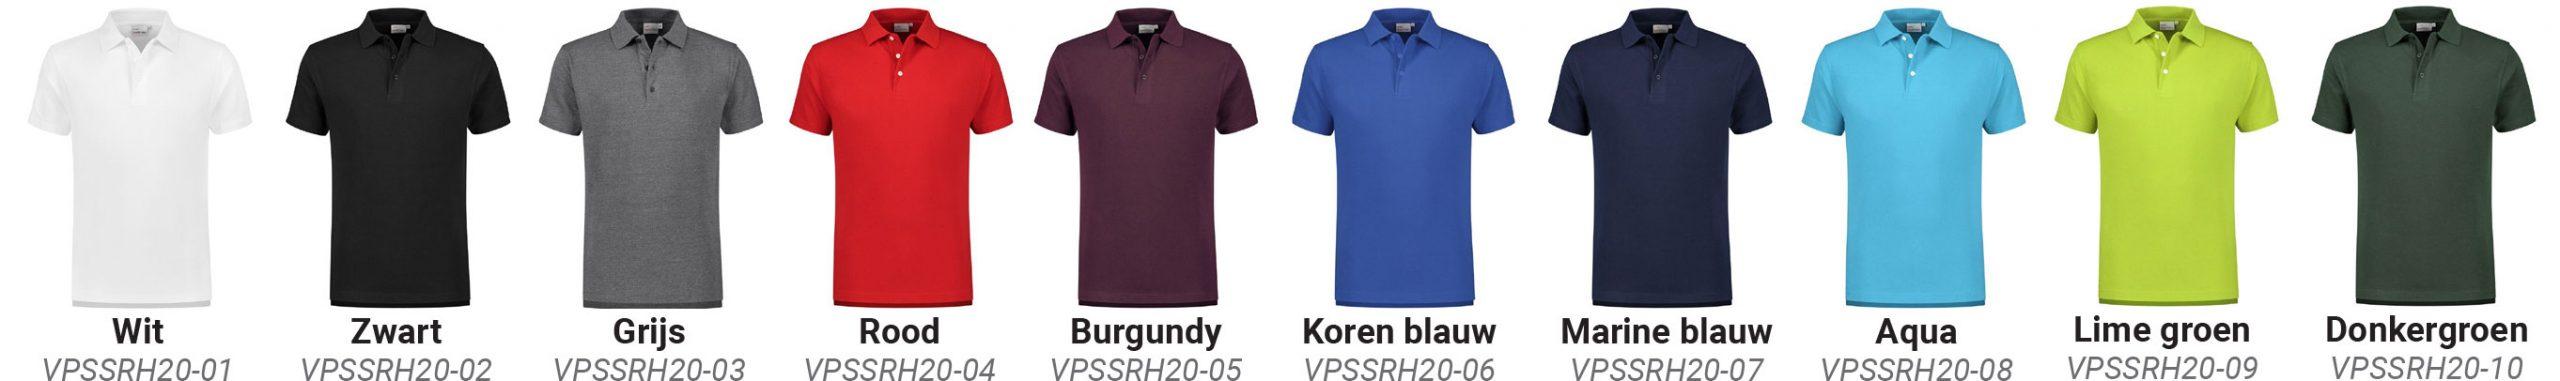 KCC Vrijetijdskleding Polo shirts